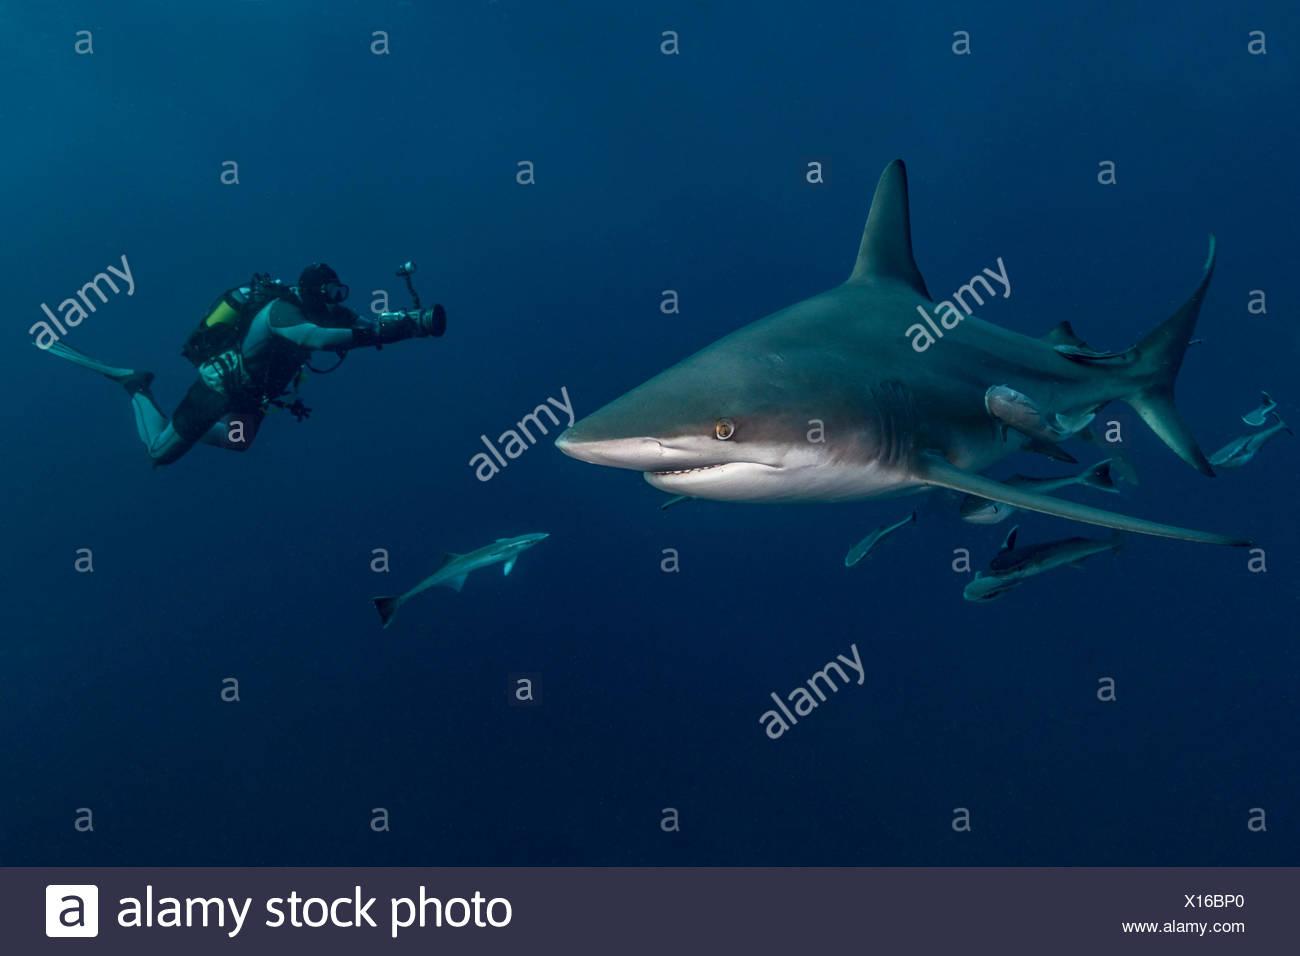 Scuba diver filming Oceanic Blacktip Shark (Carcharhinus Limbatus), Aliwal Shoal, South Africa Stock Photo